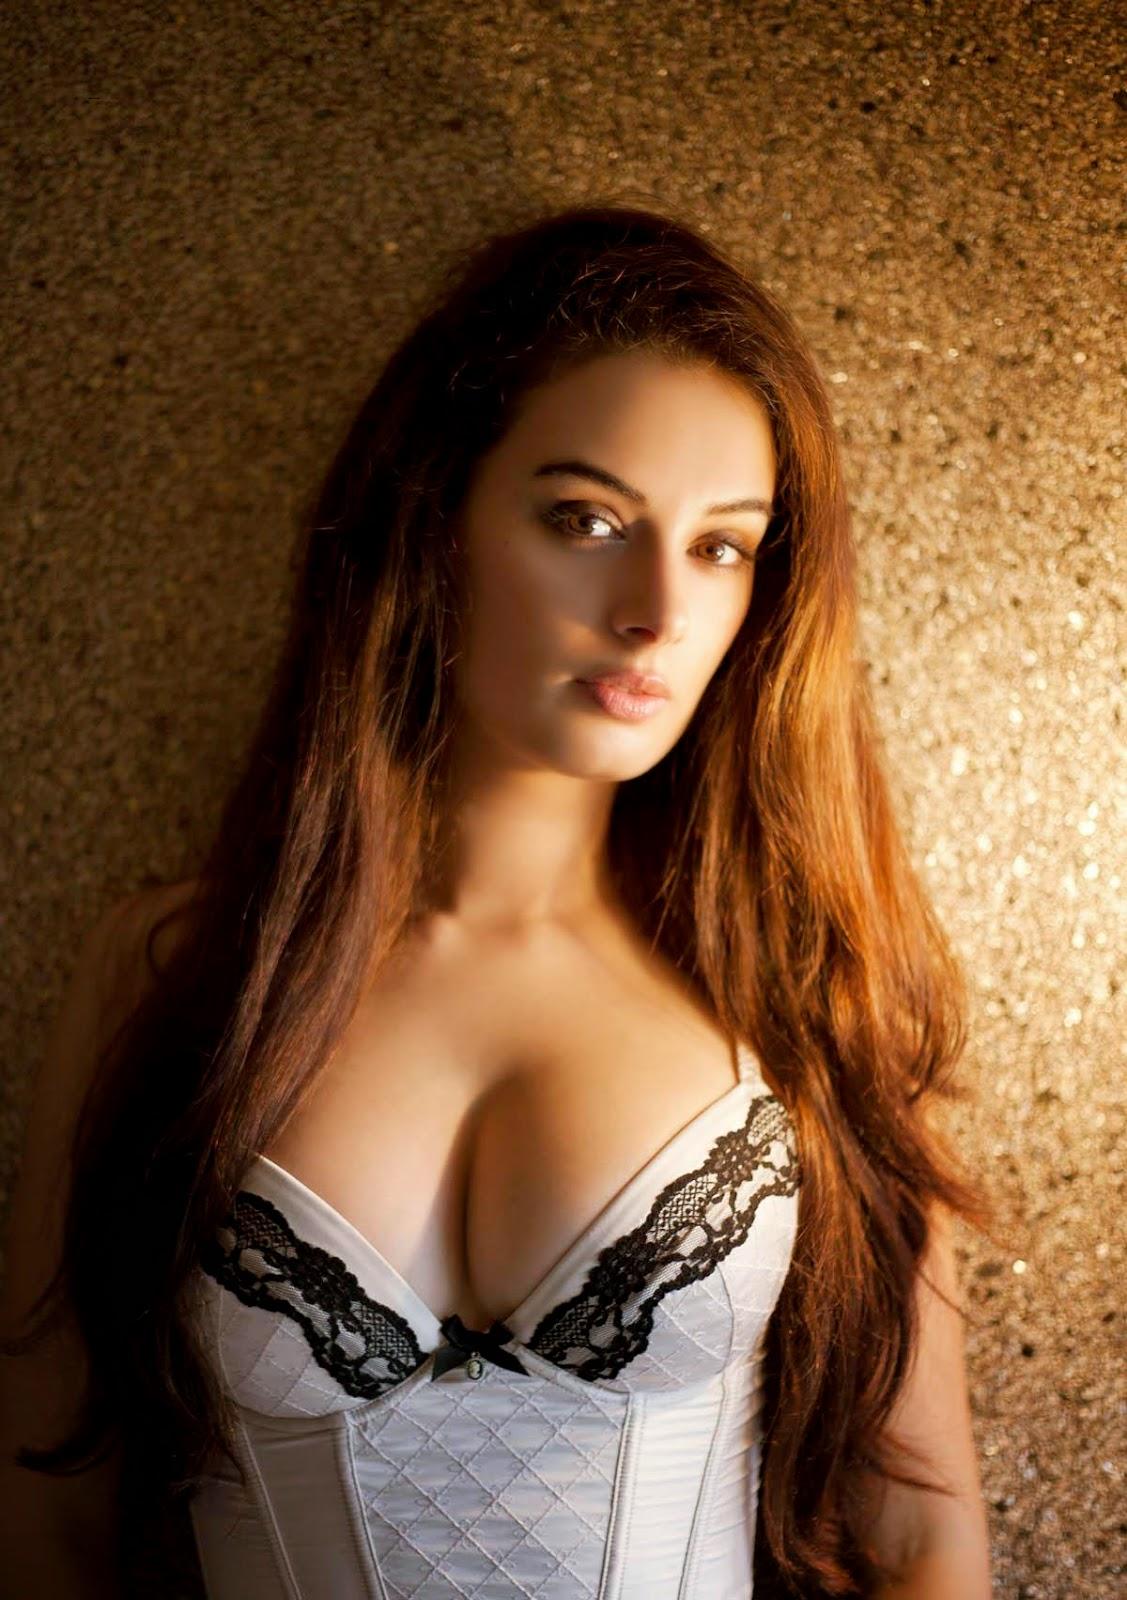 evelyn sharma hd photo gallery 2015   kareena kapoor new images 2015